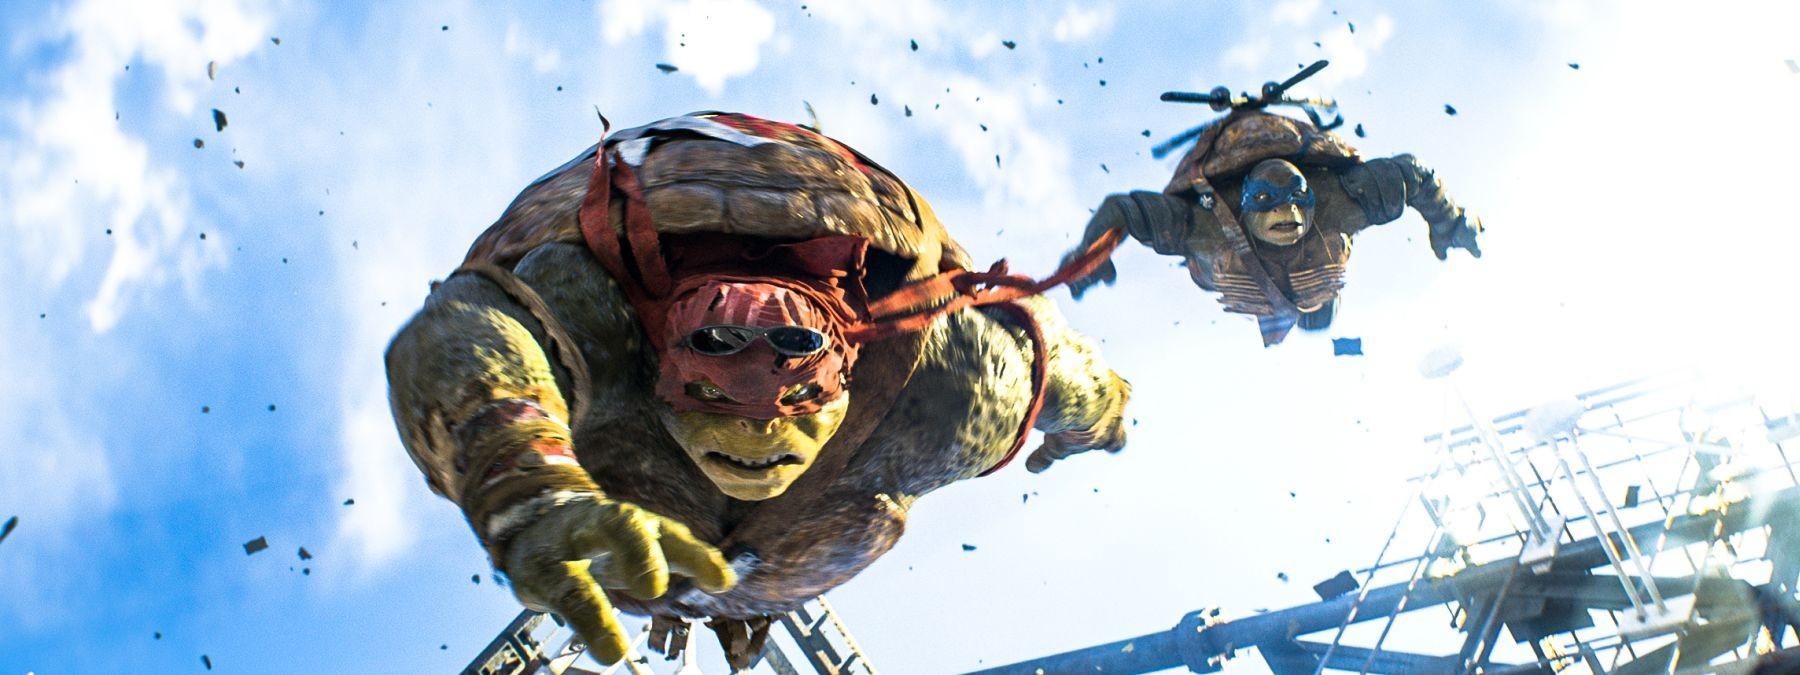 Tartarughe Ninja: tartarughe mutanti in volo in una scena tratta dal film